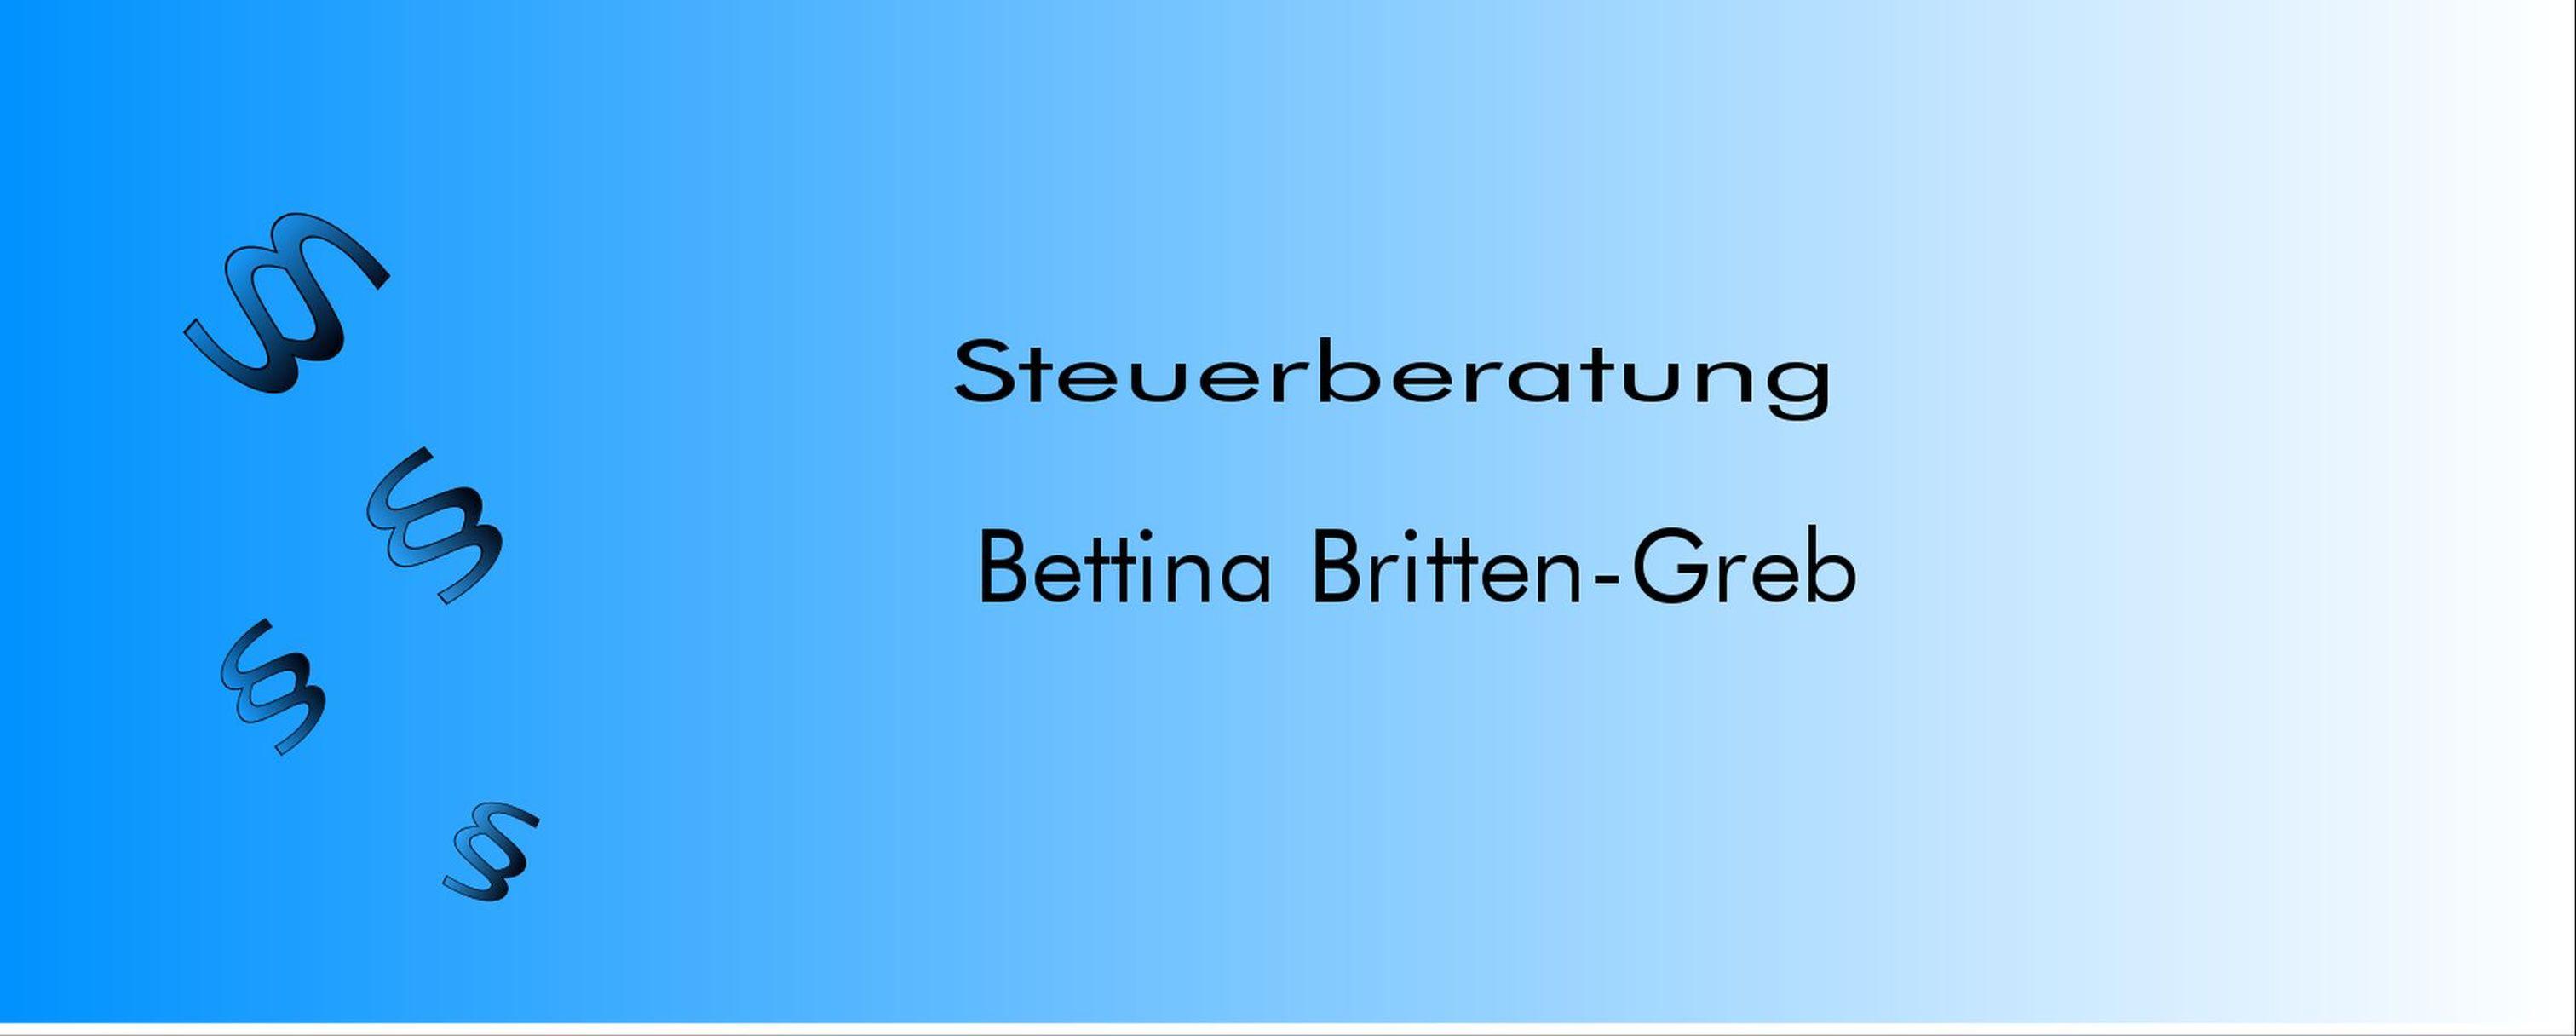 Steuerberatung Bettina Britten-Greb Logo